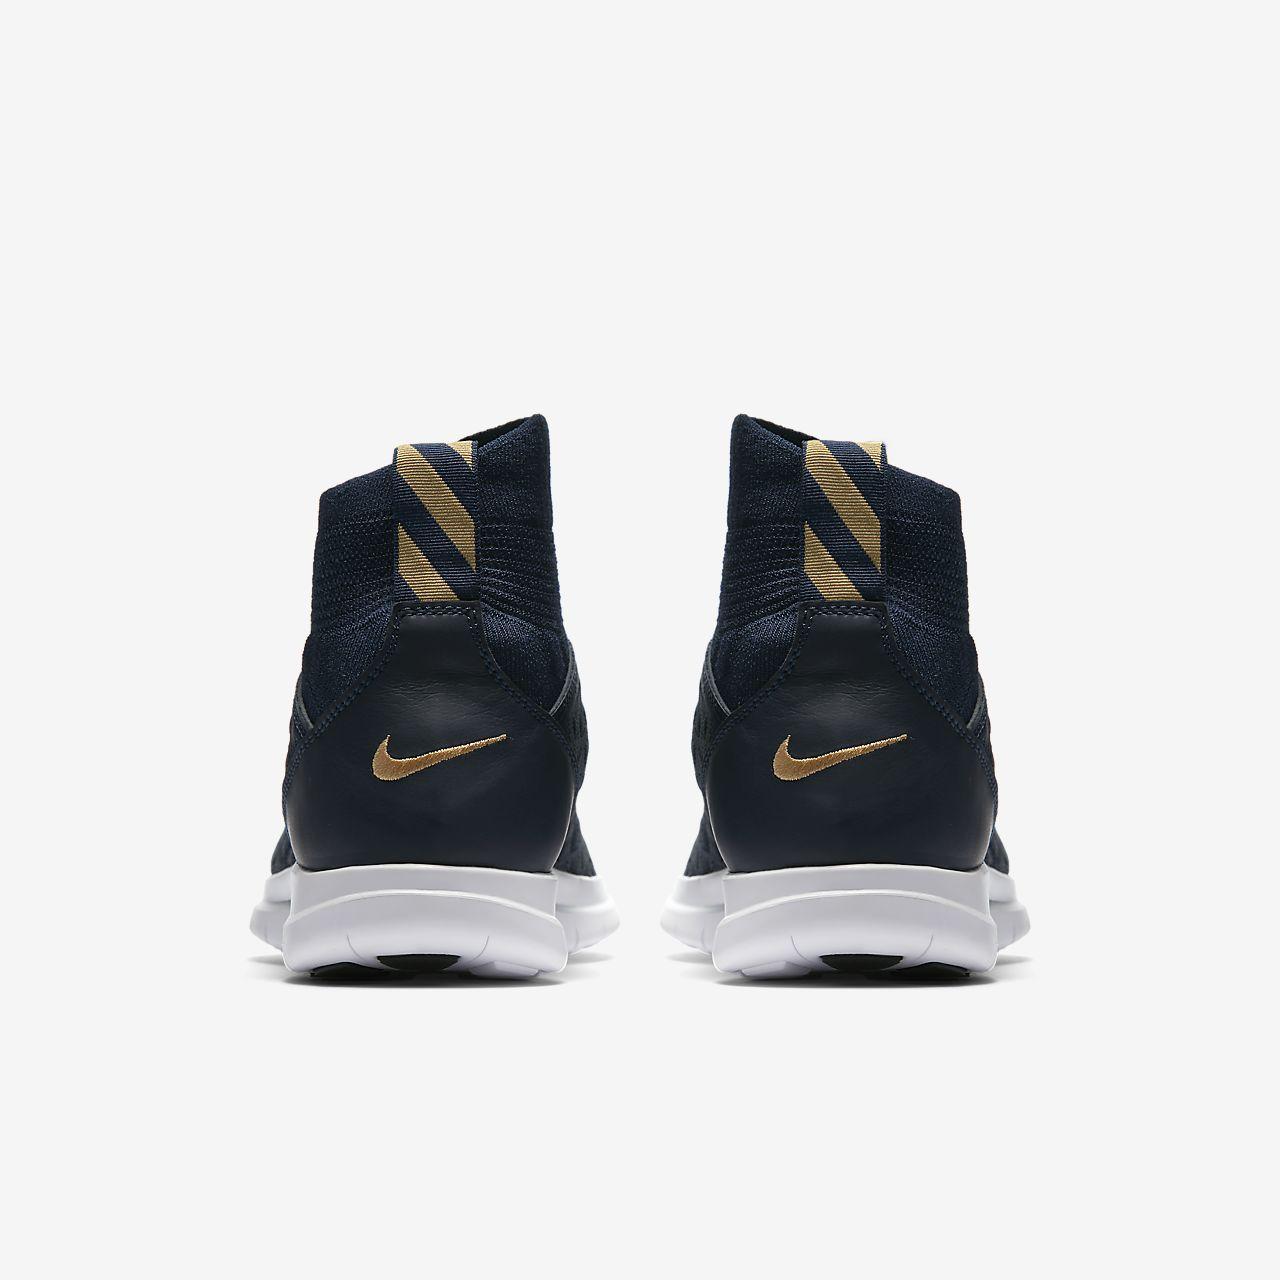 a9671406d5fe Low Resolution Nike Free Hypervenom III FC Flyknit Men s Shoe Nike Free  Hypervenom III FC Flyknit Men s Shoe